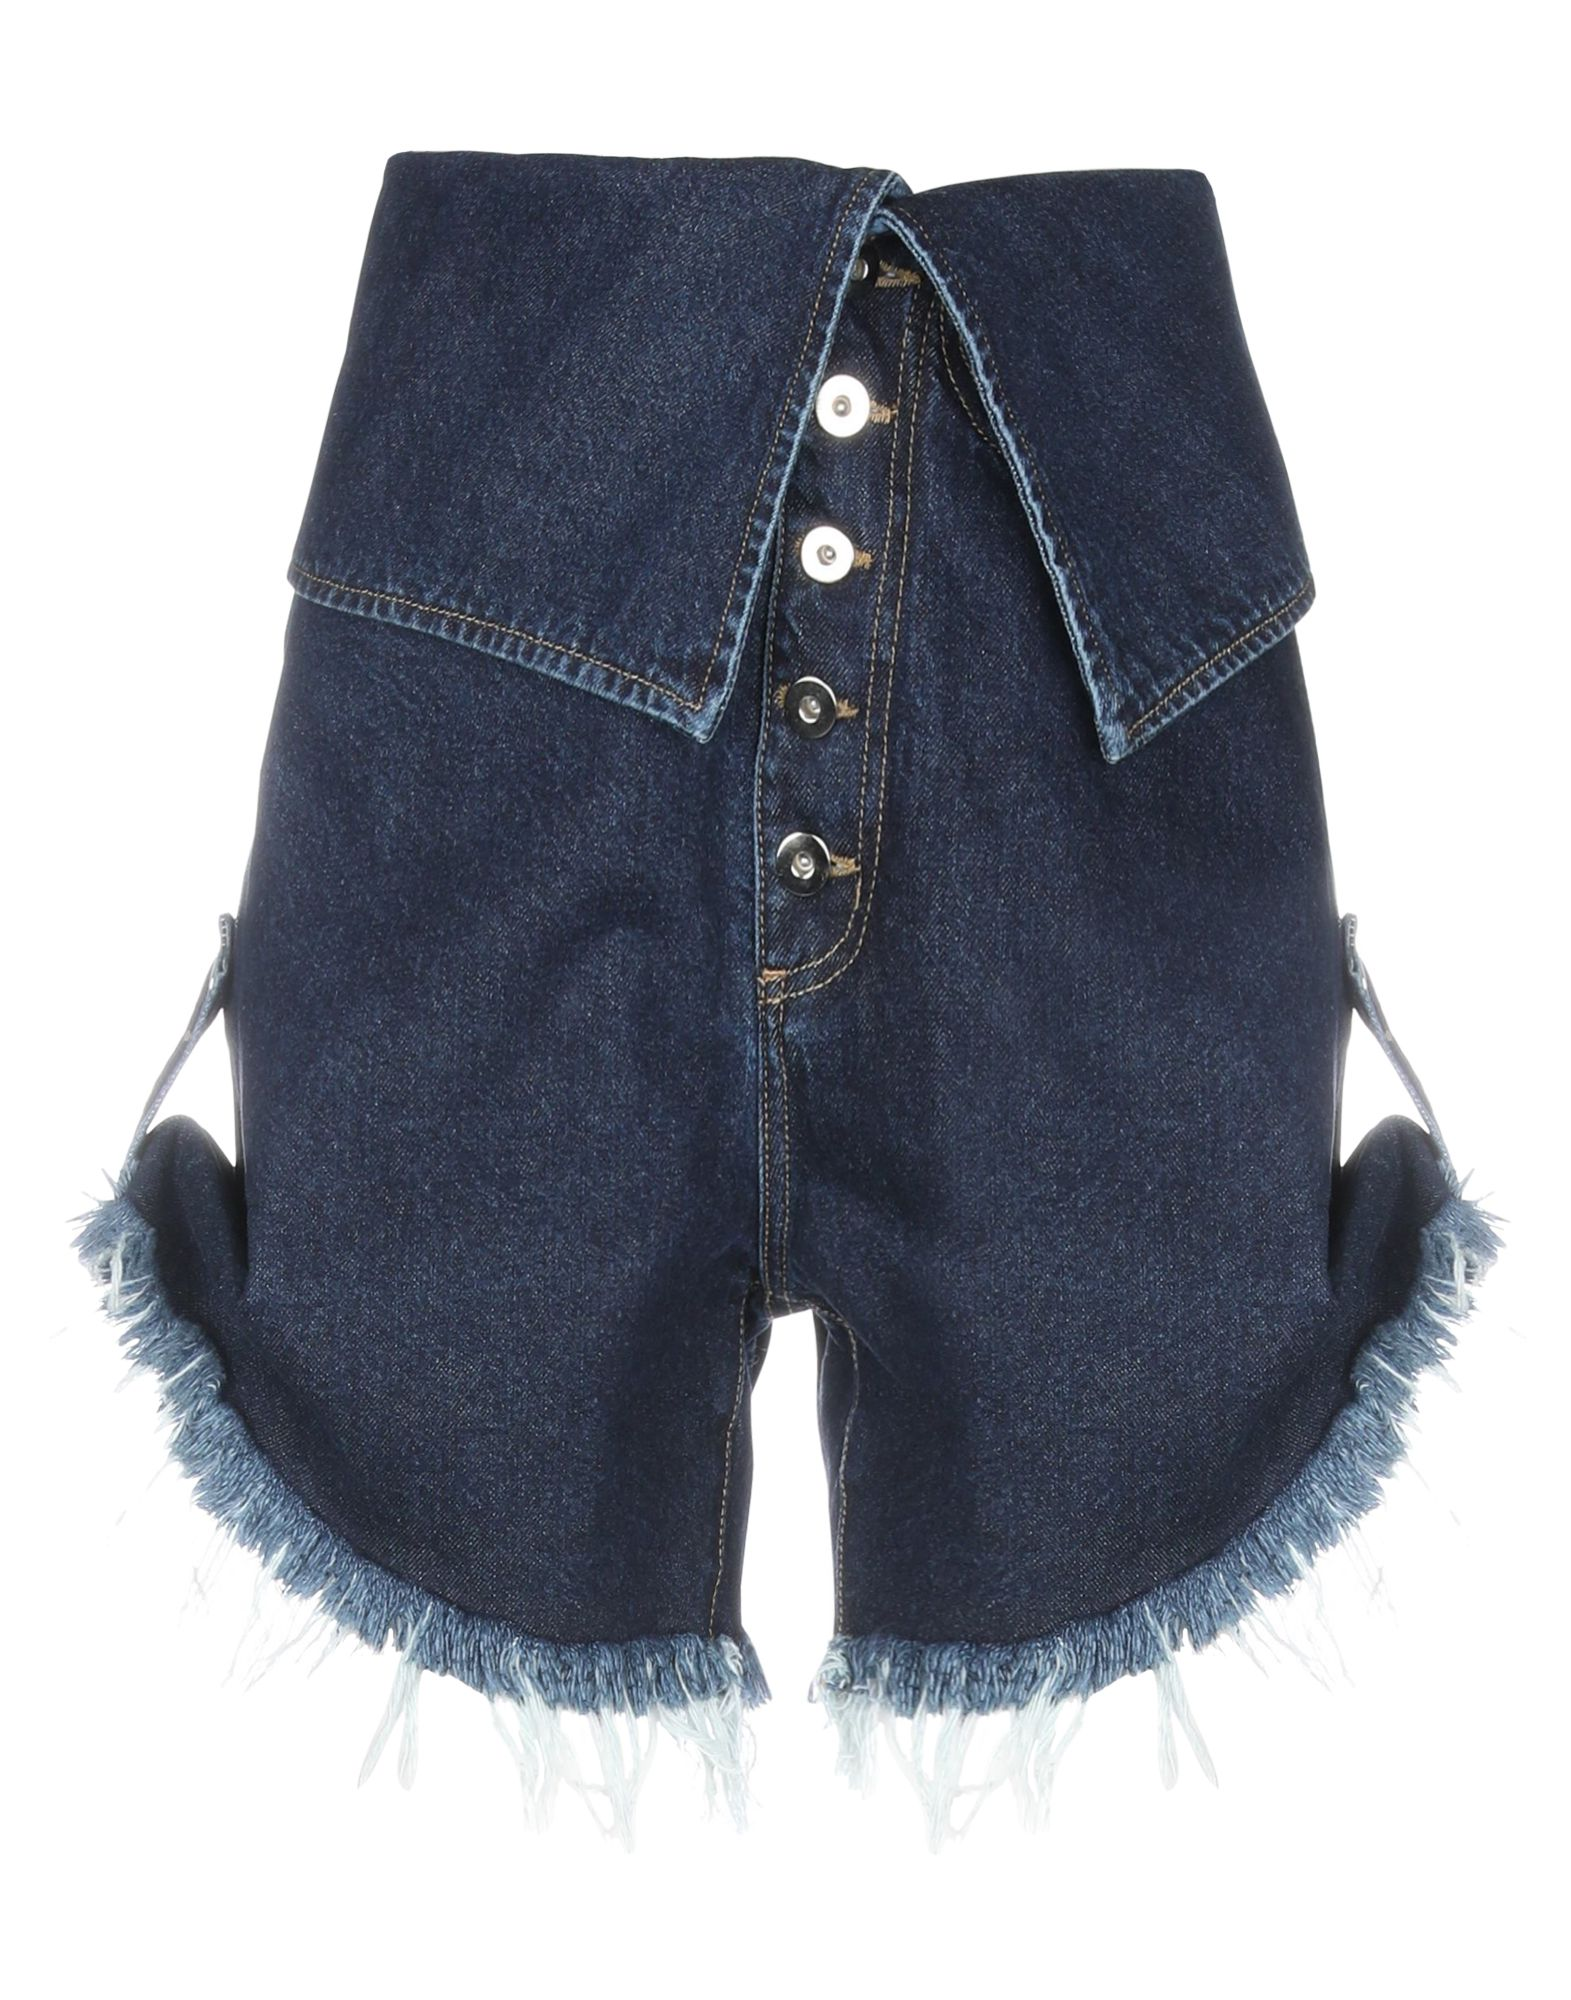 MARQUES' ALMEIDA Джинсовые шорты marques almeida корсет из денима